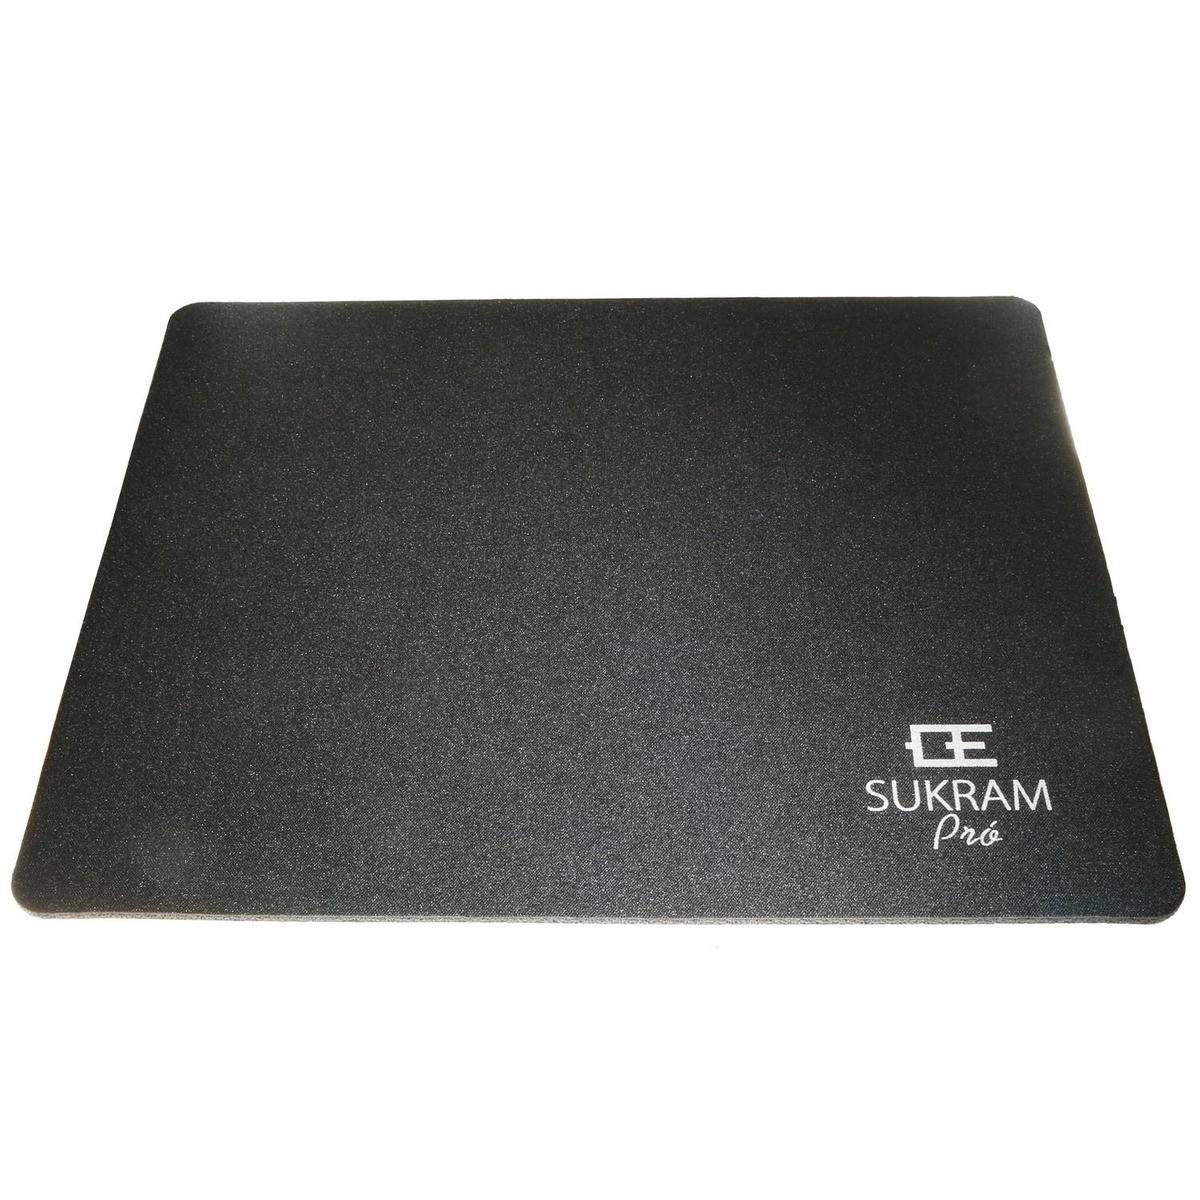 Mousepad Pequeno Basico Emborrachado Sukram Preto